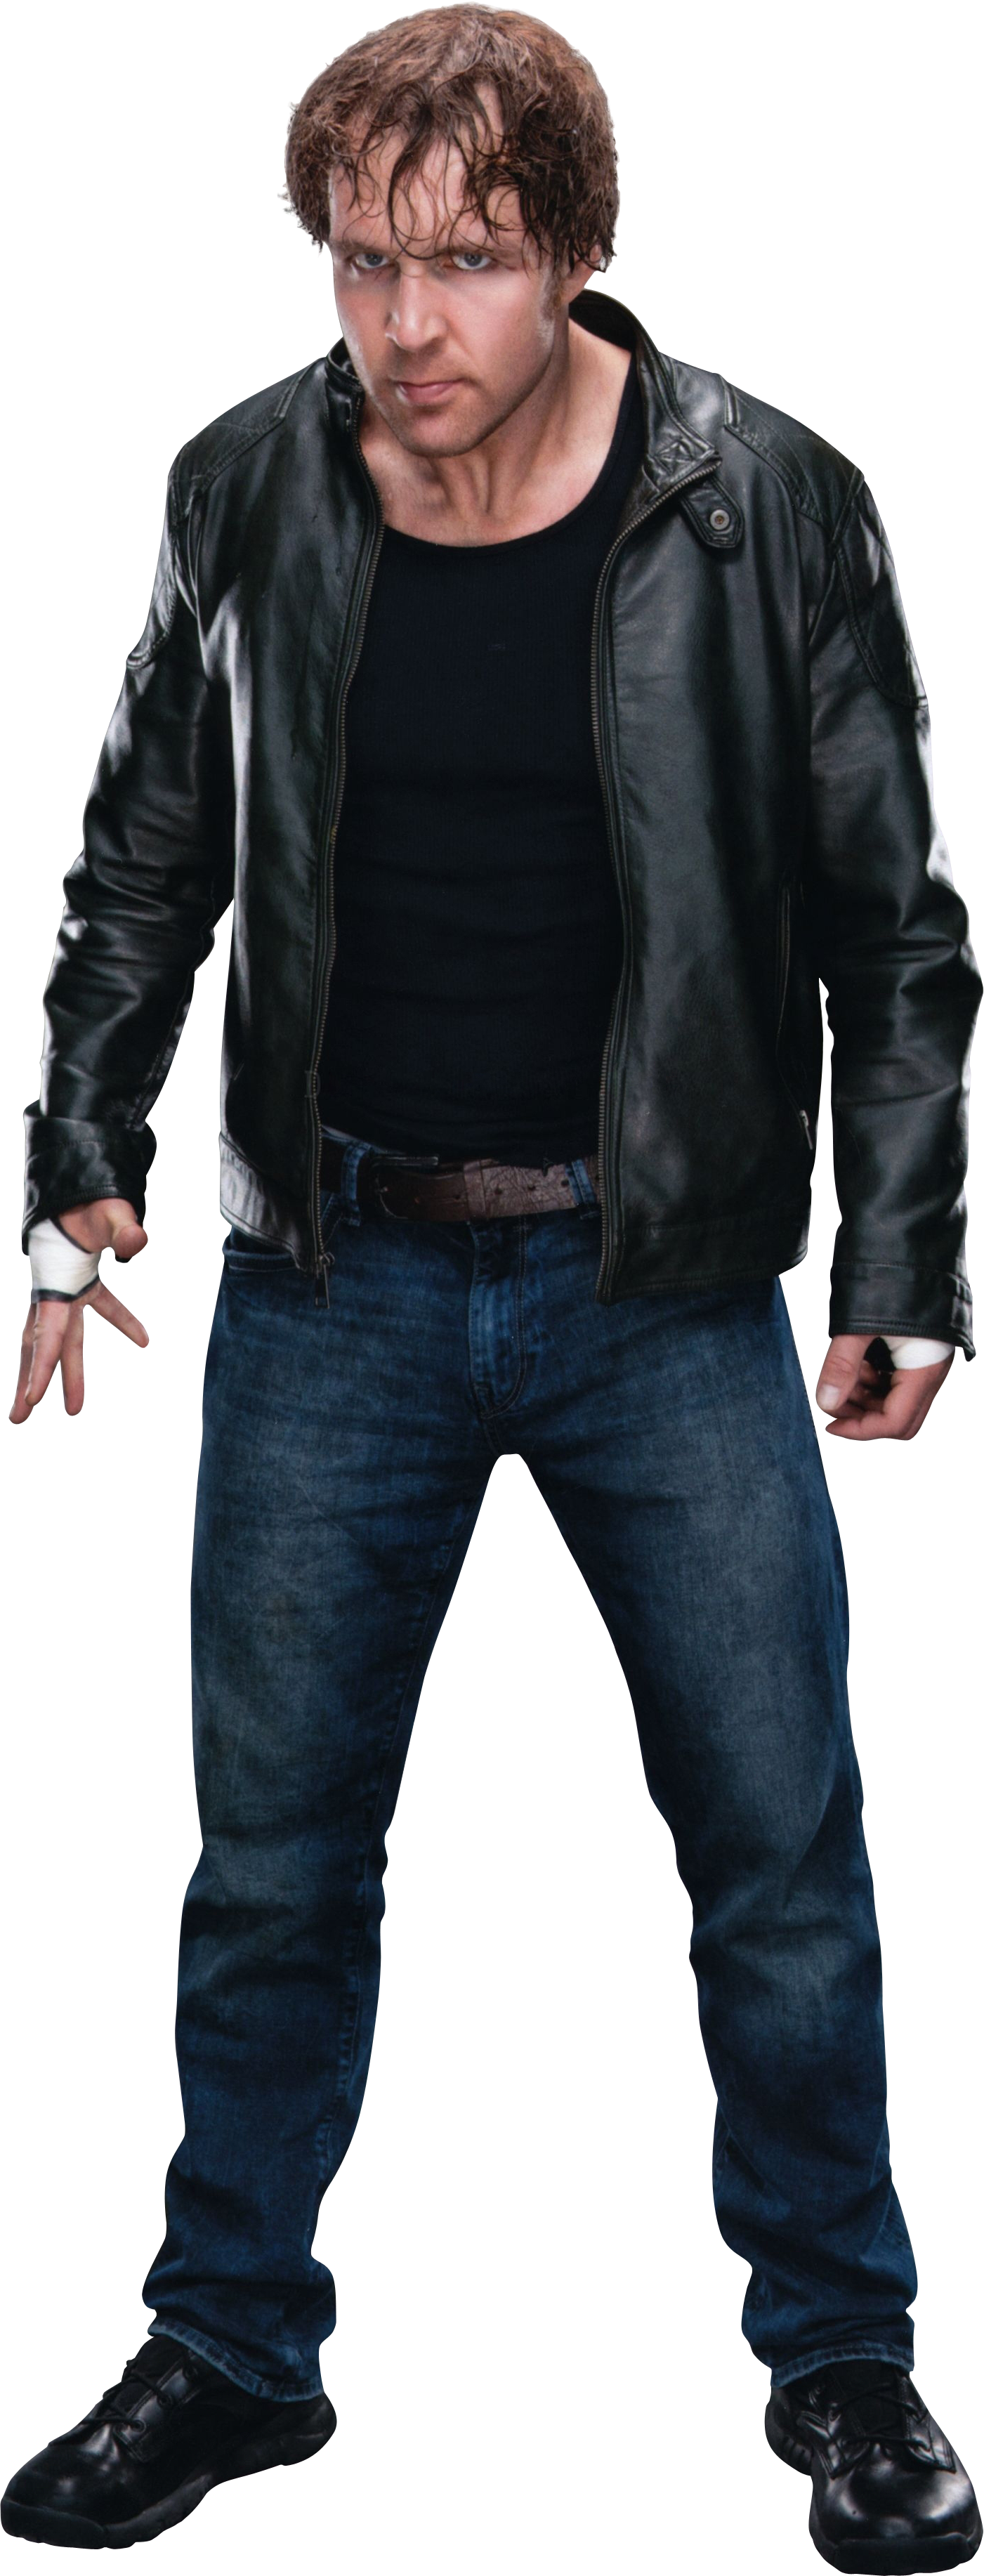 Dean Ambrose Jacket Png 1401 3667 Wwe Dean Ambrose Dean Ambrose Dean